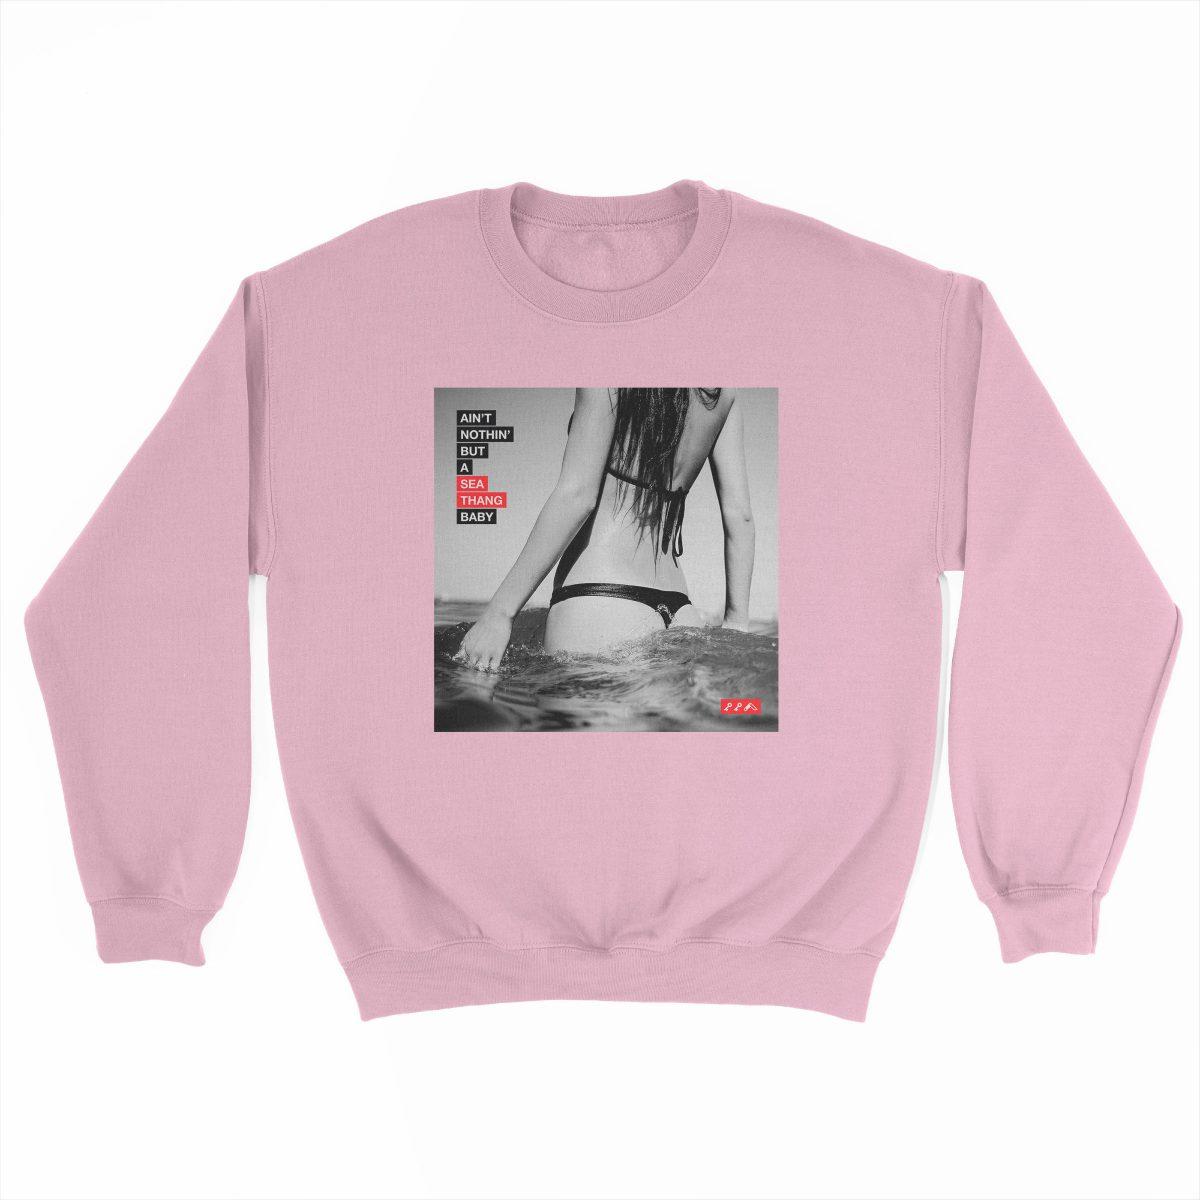 SEA THANG sexy ocean gangsta rap graphic on a light pink sweatshirt at kikicutt.com